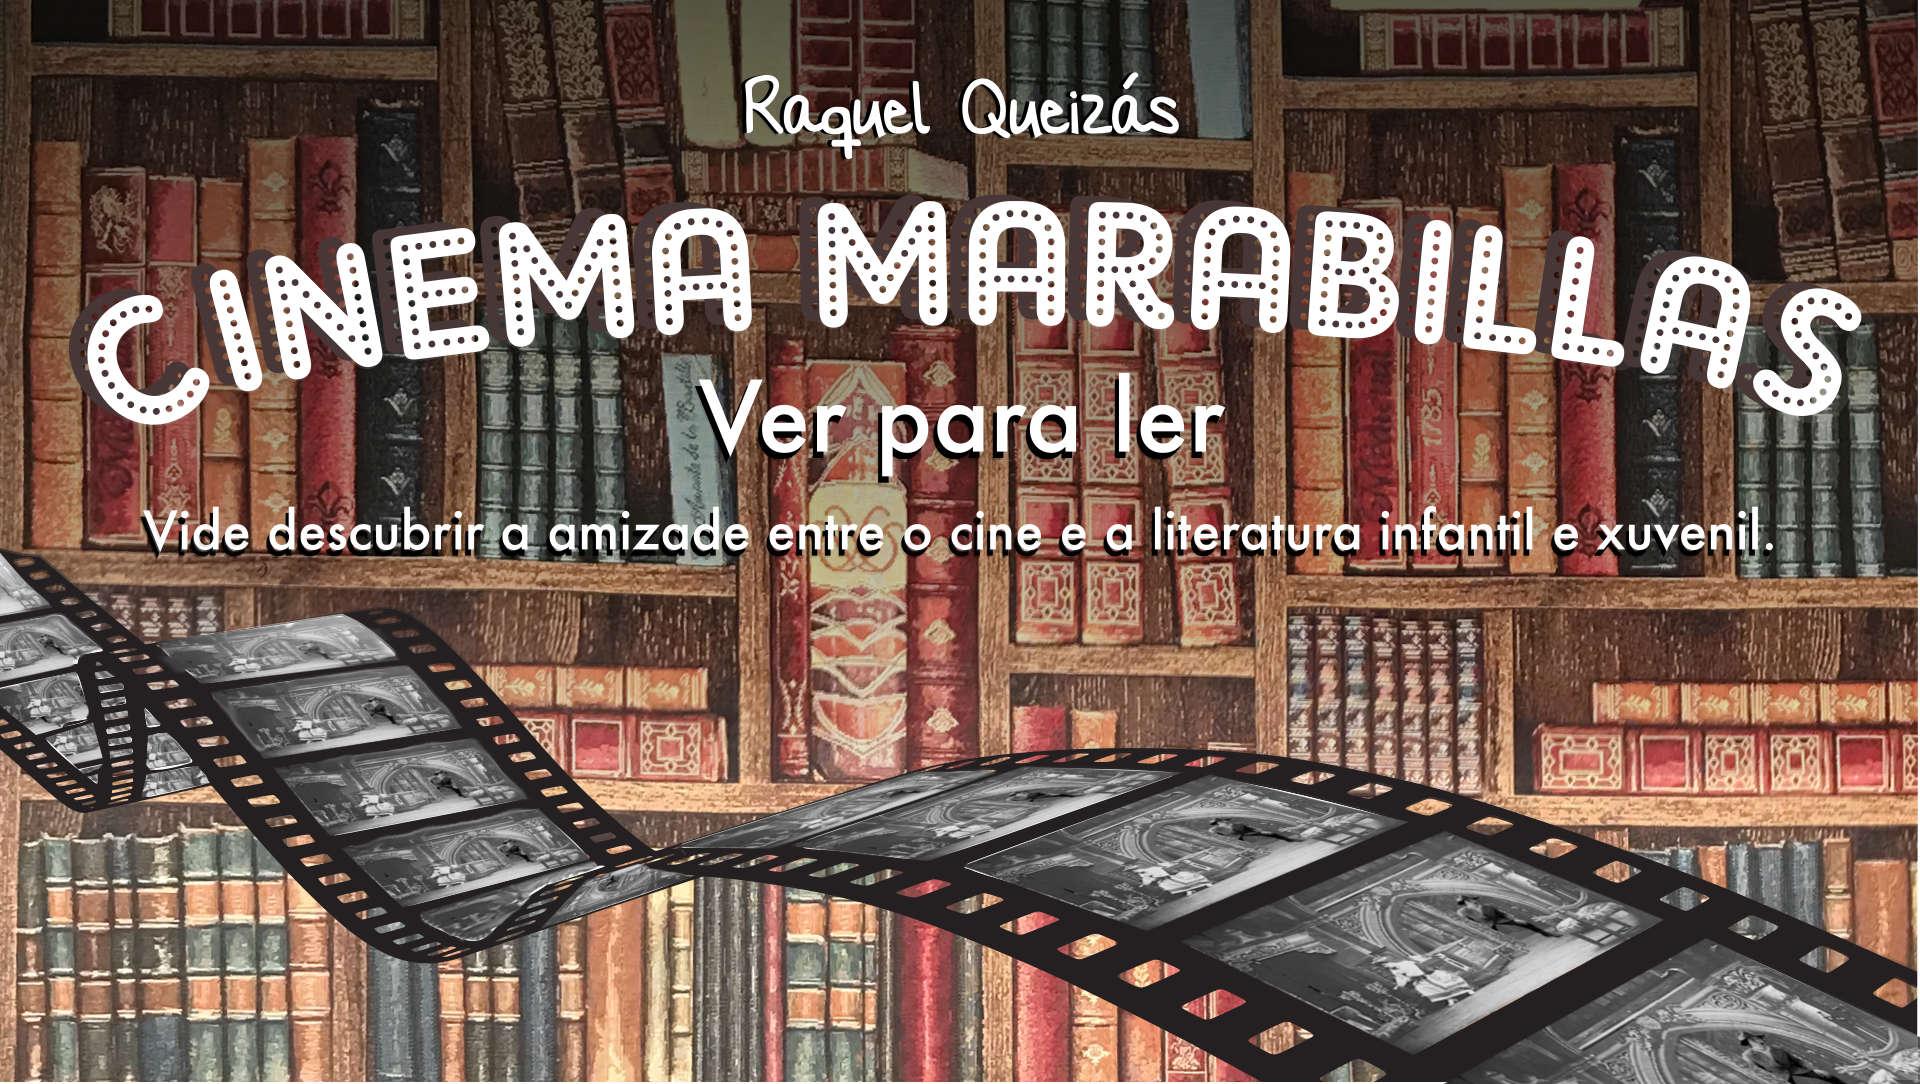 https://www.raquelqueizas.com/wp-content/uploads/CINEMA-MARABILLAS-SLIDER.jpg